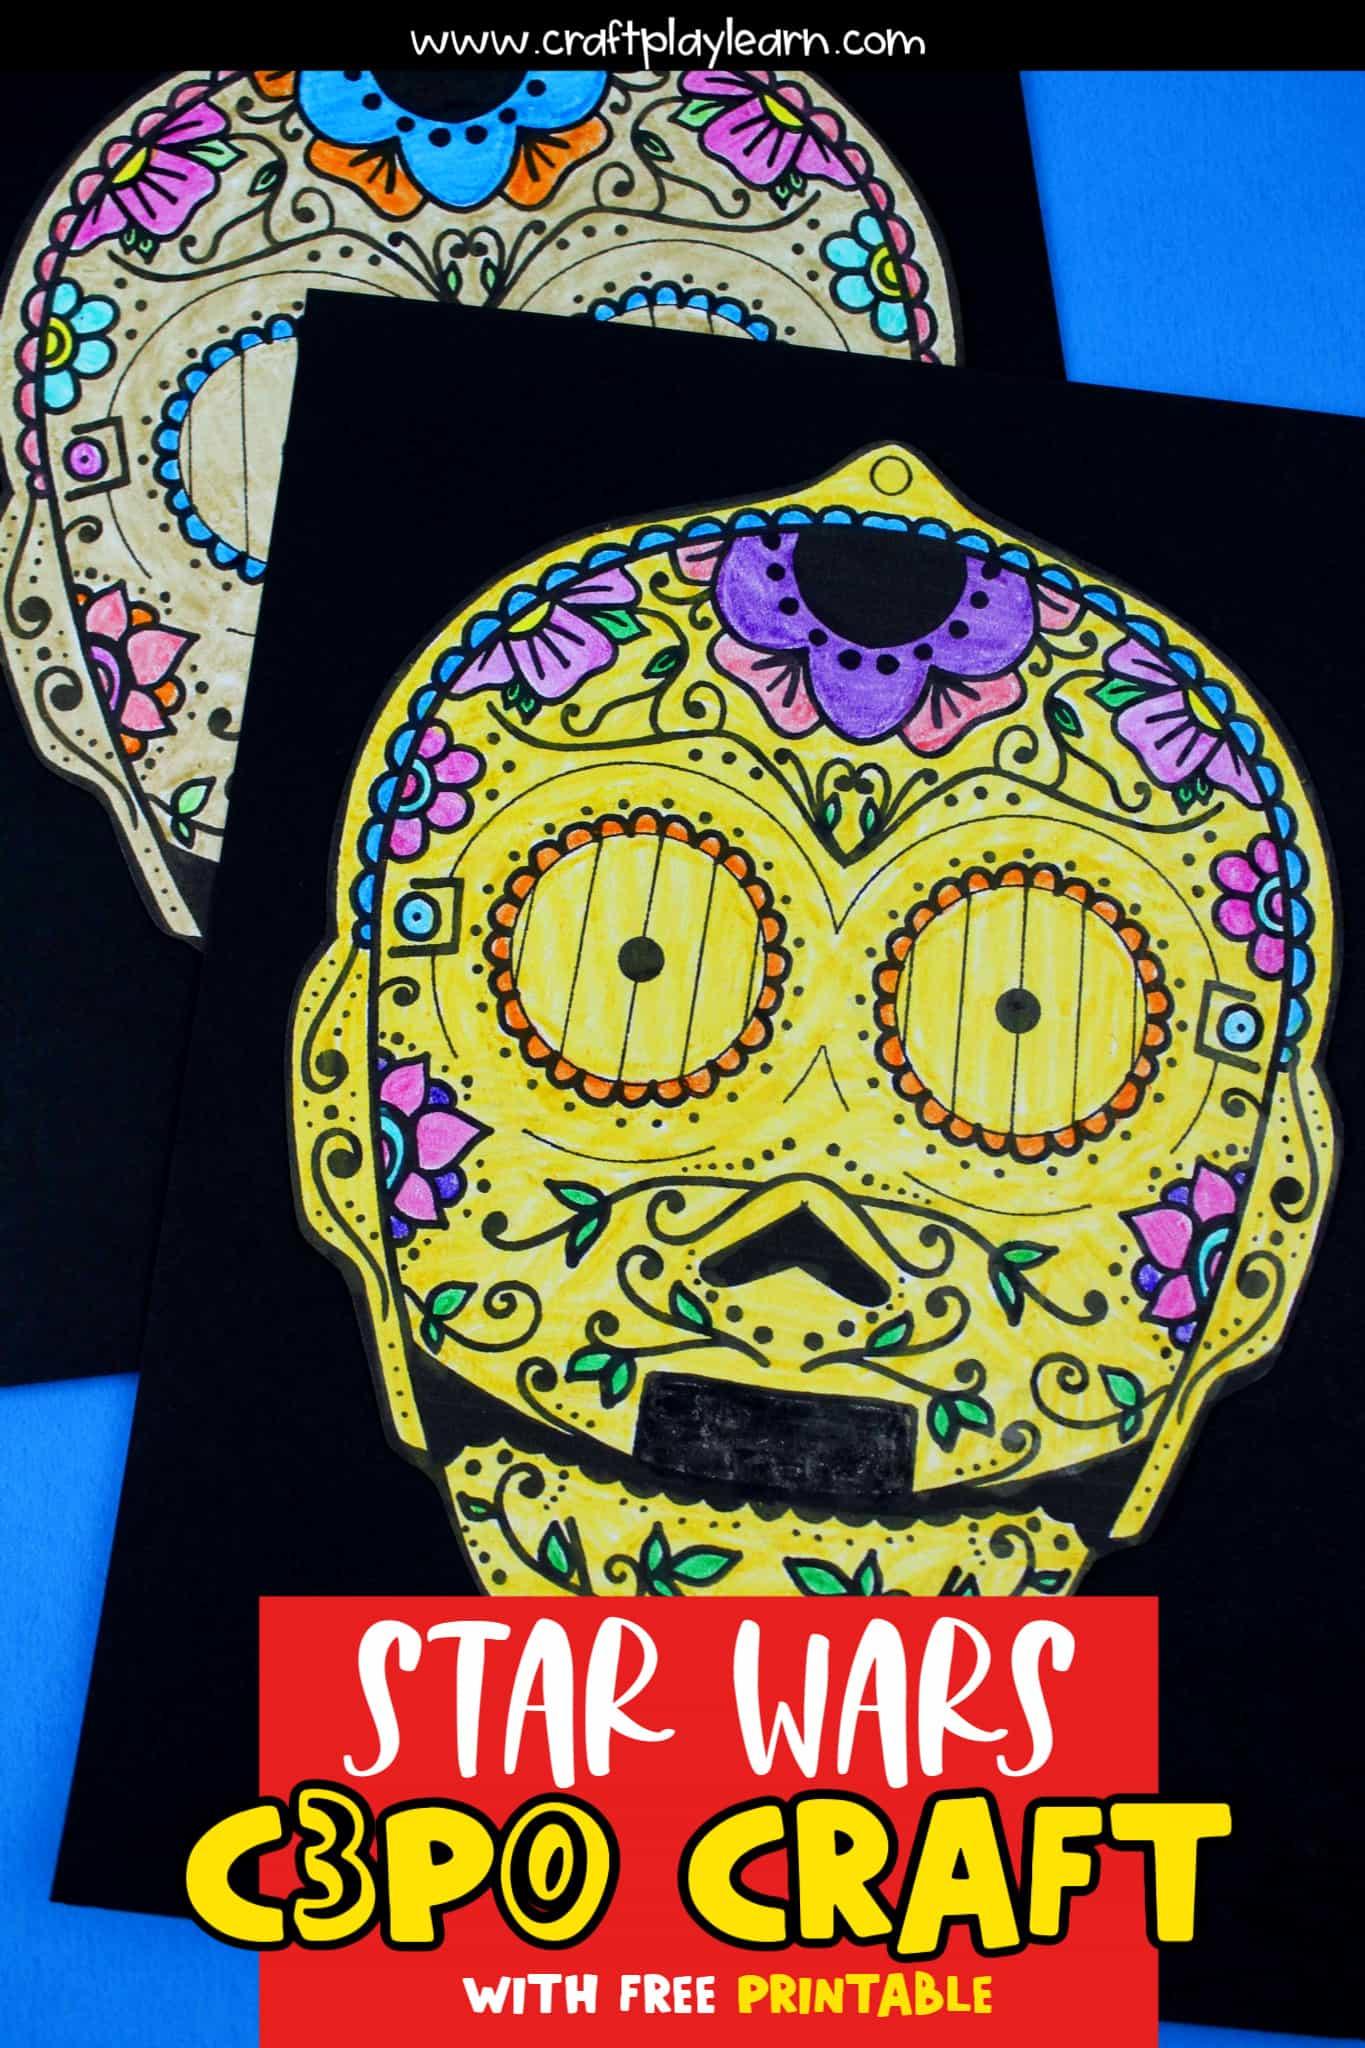 star wars c3p0 craft and sugar skull art